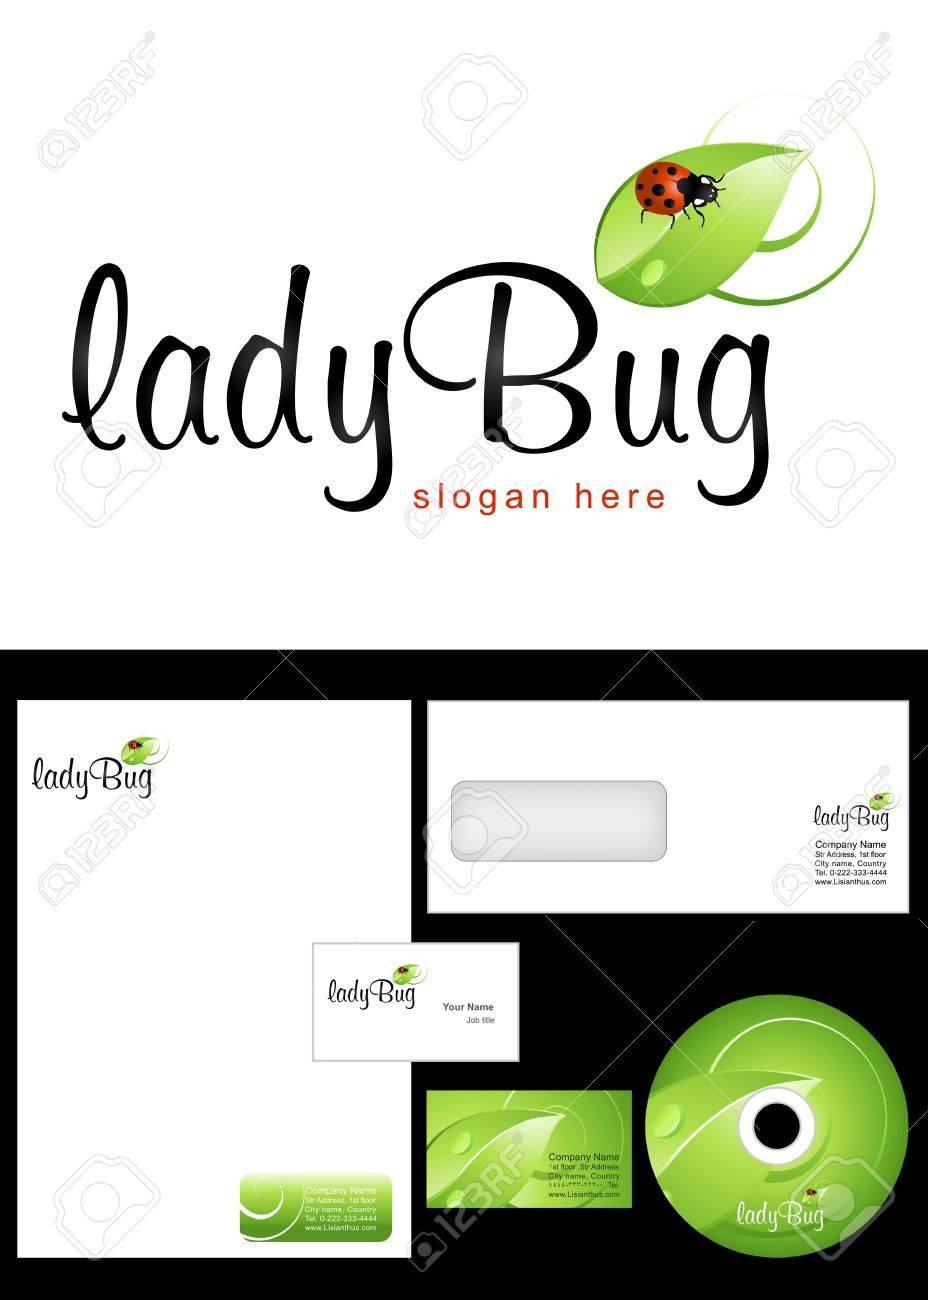 Ladybug Logo Design And Corporate Identity Package Including ...